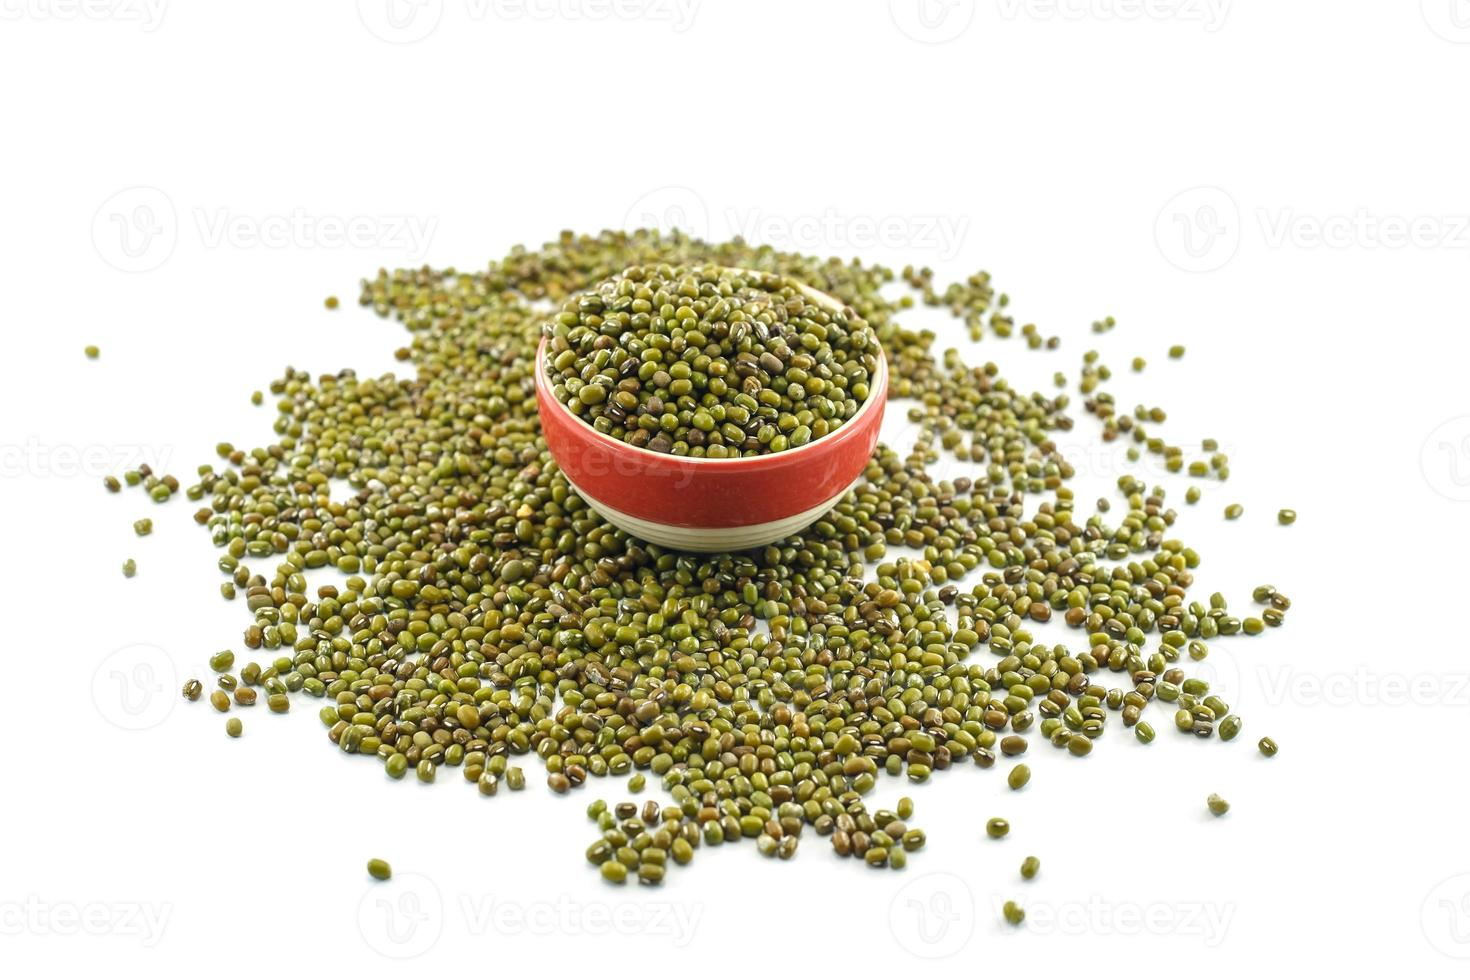 haricot vert ou haricot mungo isolé sur fond blanc photo